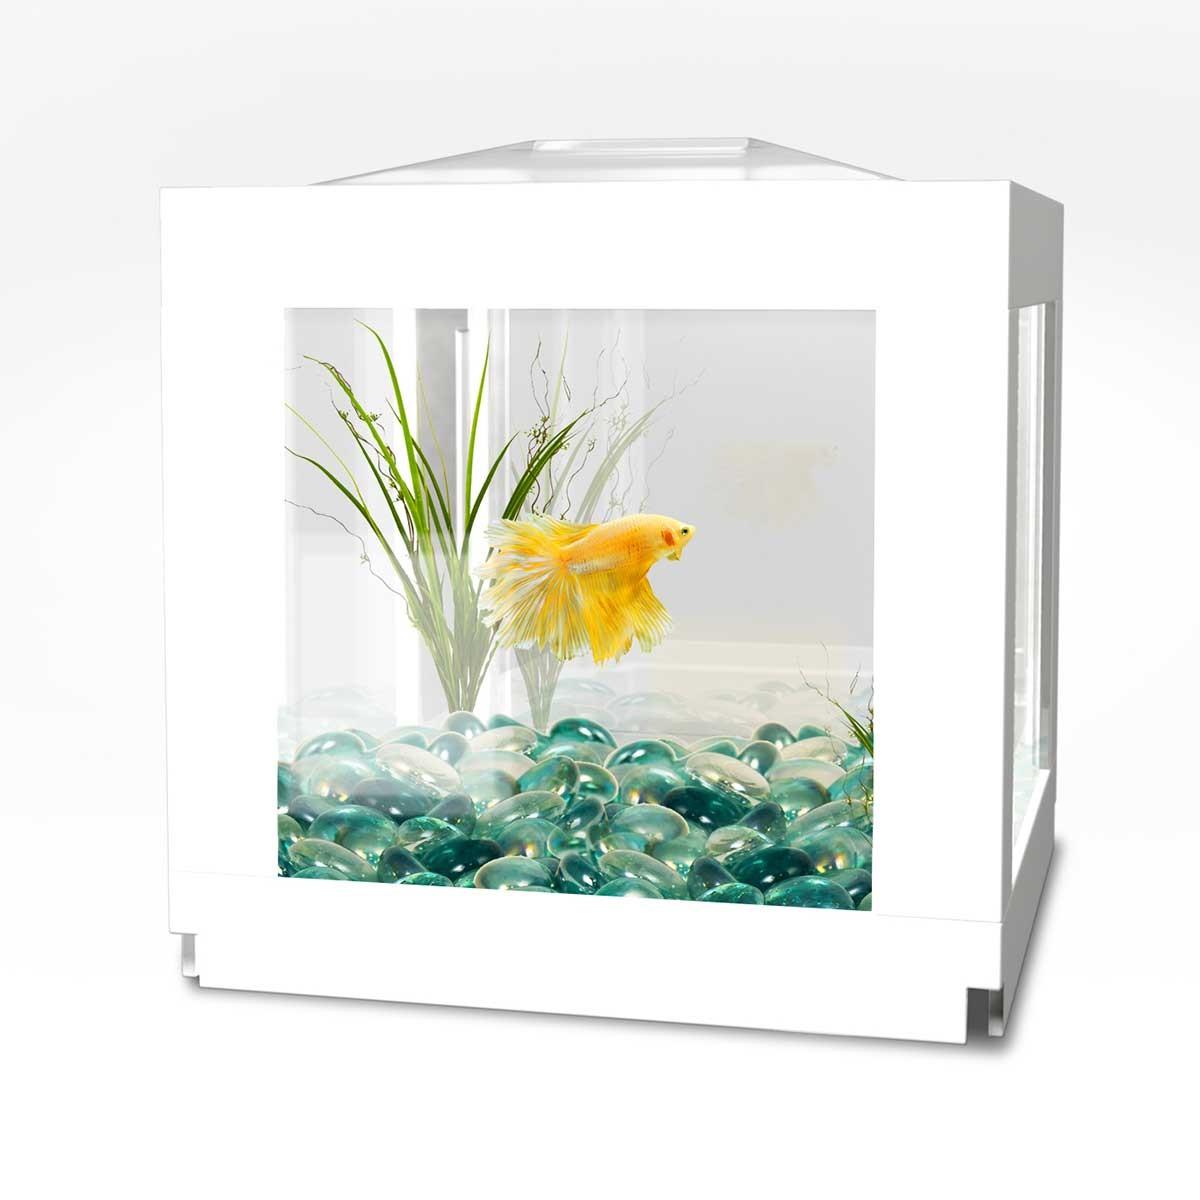 Biobubble deco cube habitat white for Deco habitat